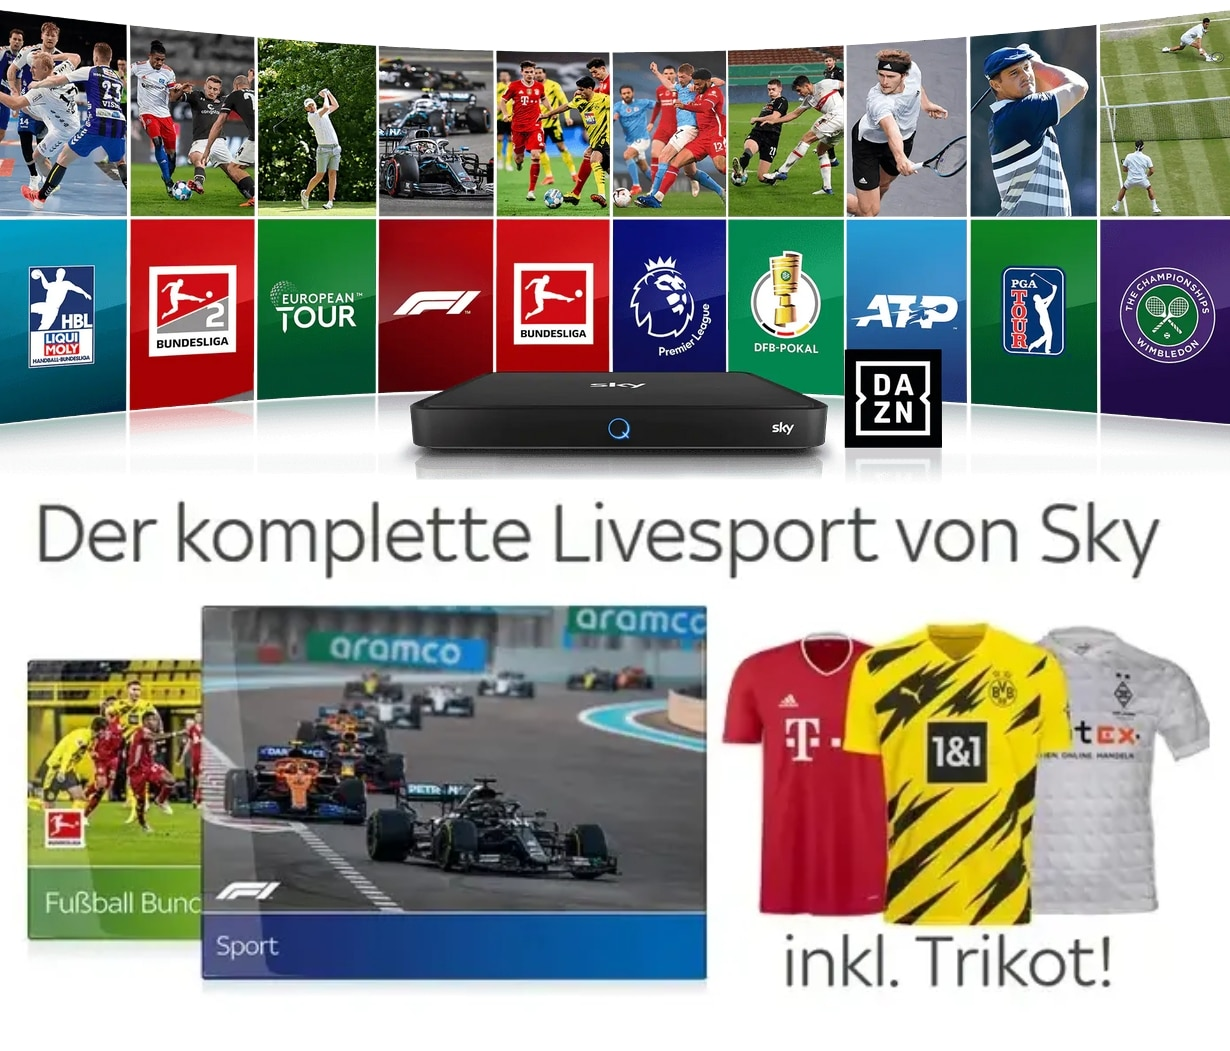 sky-angebote-trikot-sport-2021